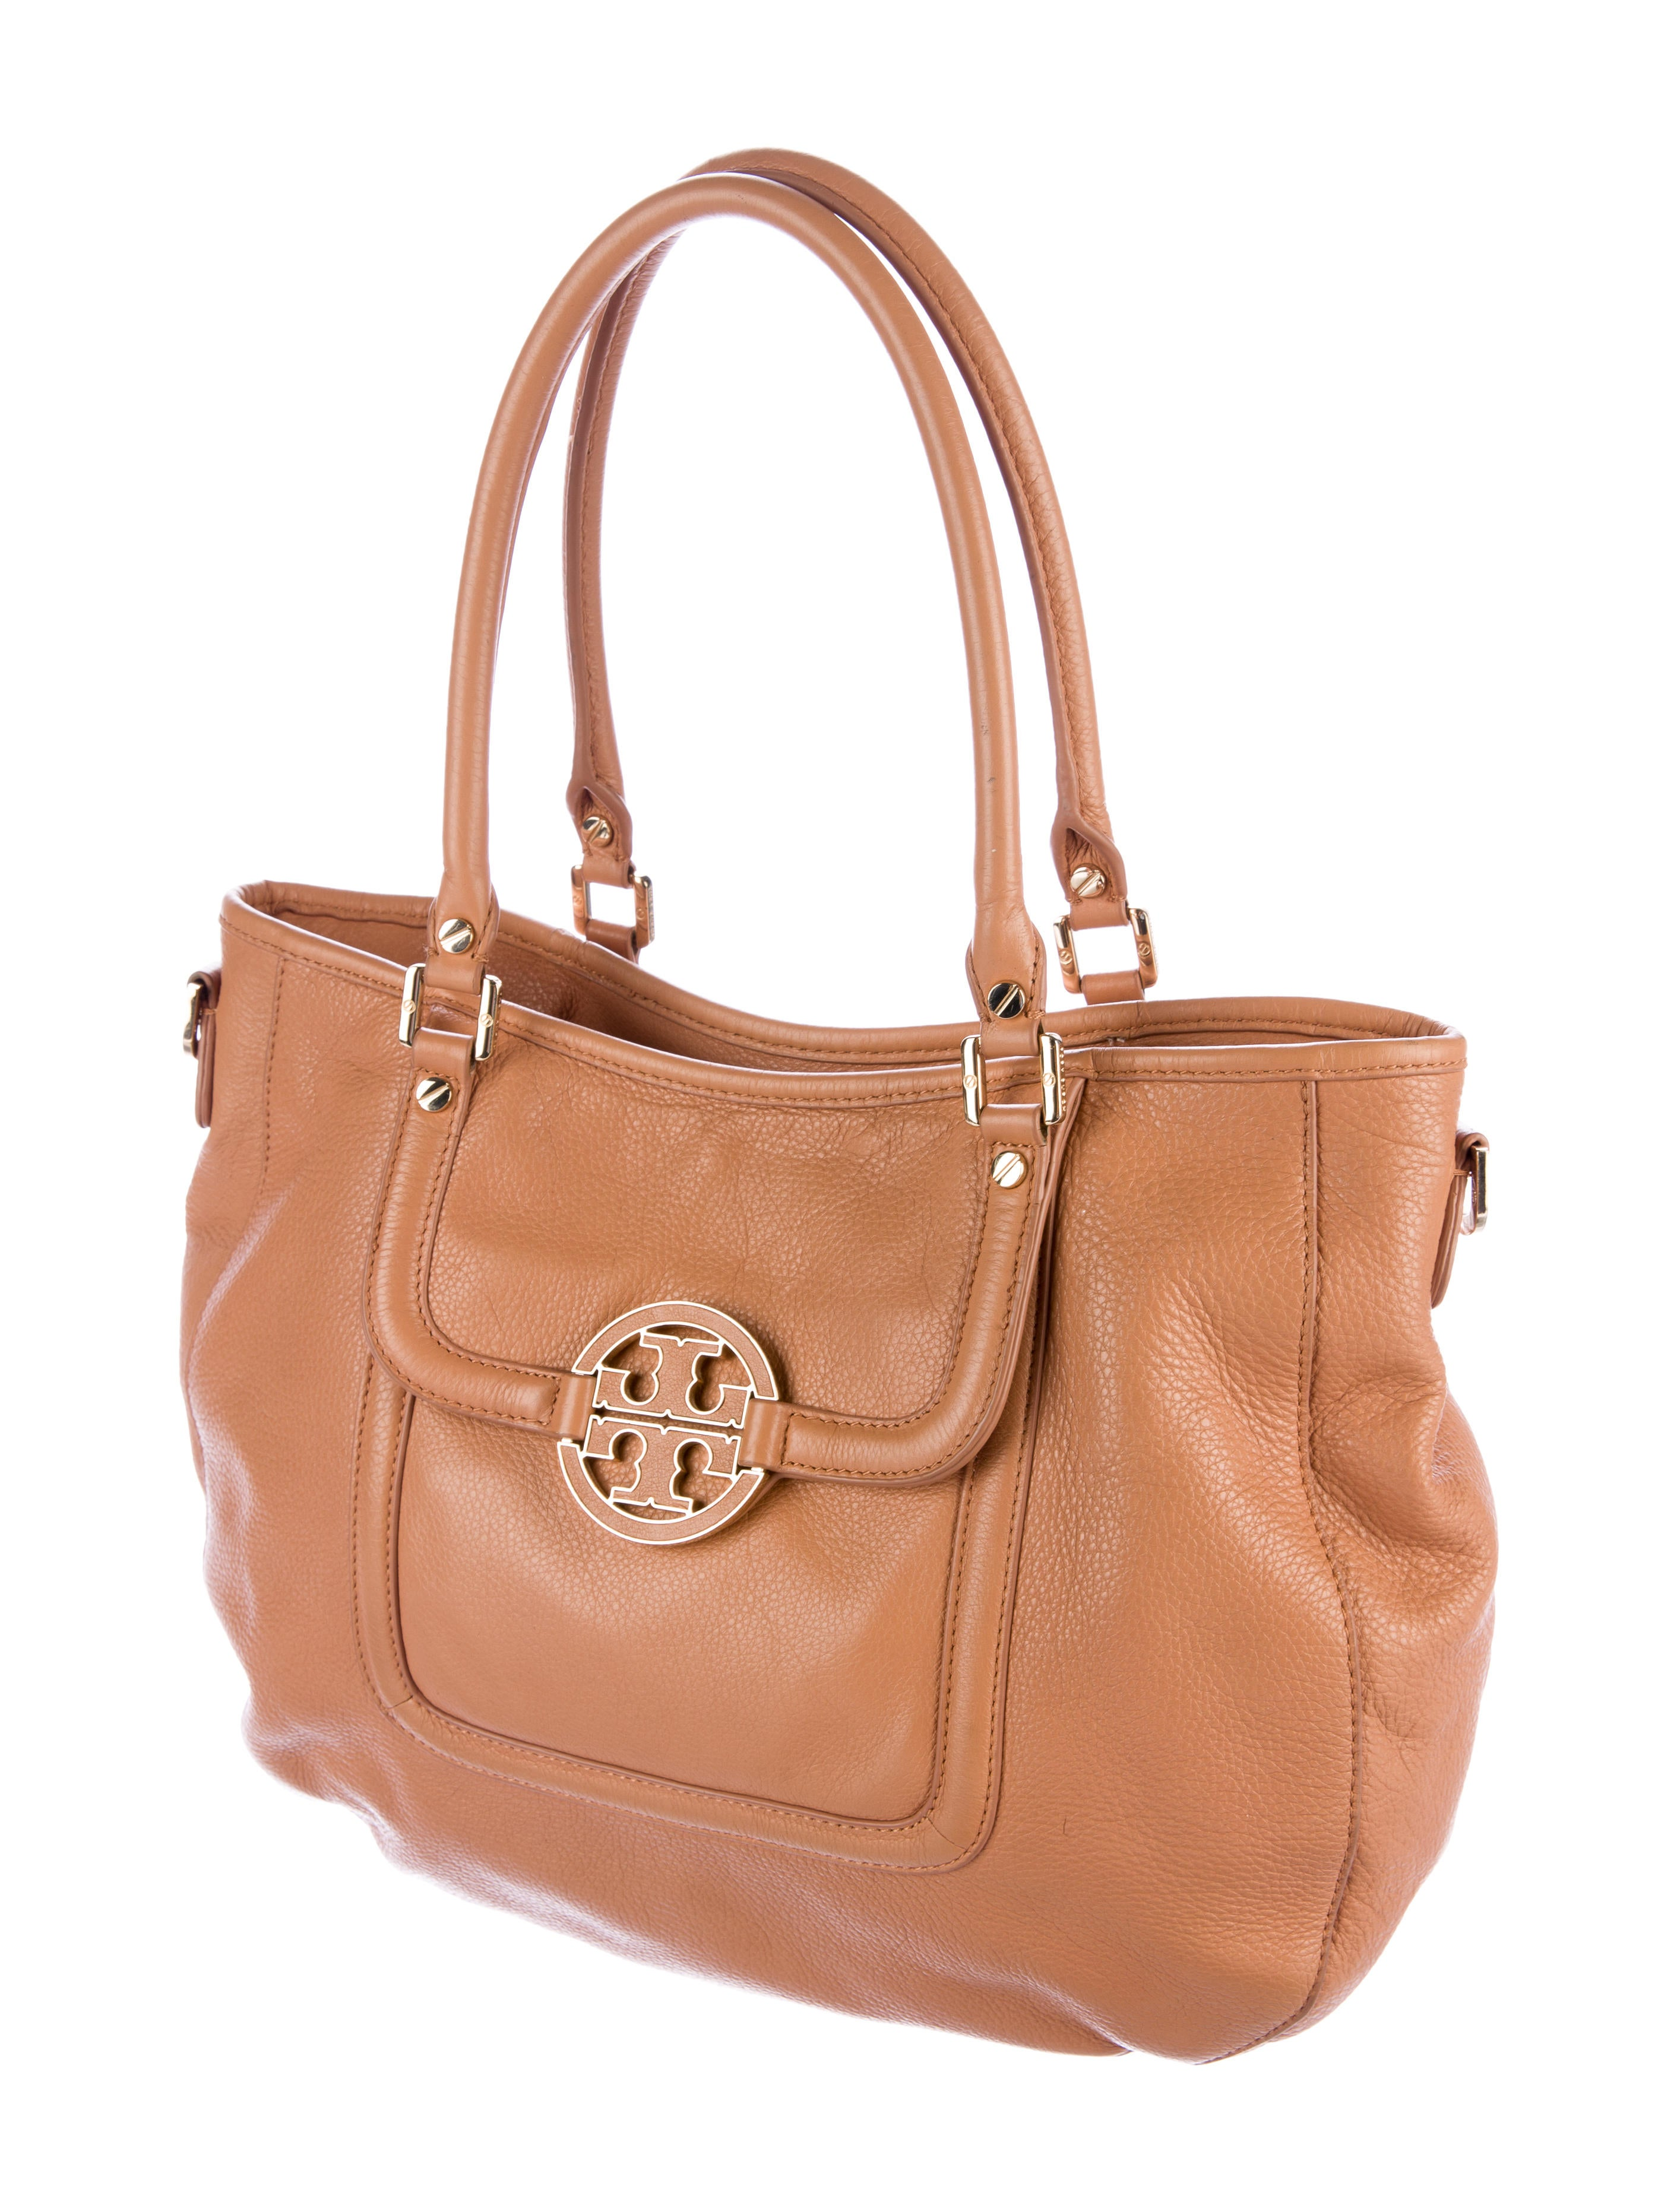 tory burch leather amanda satchel   handbags   wto101811